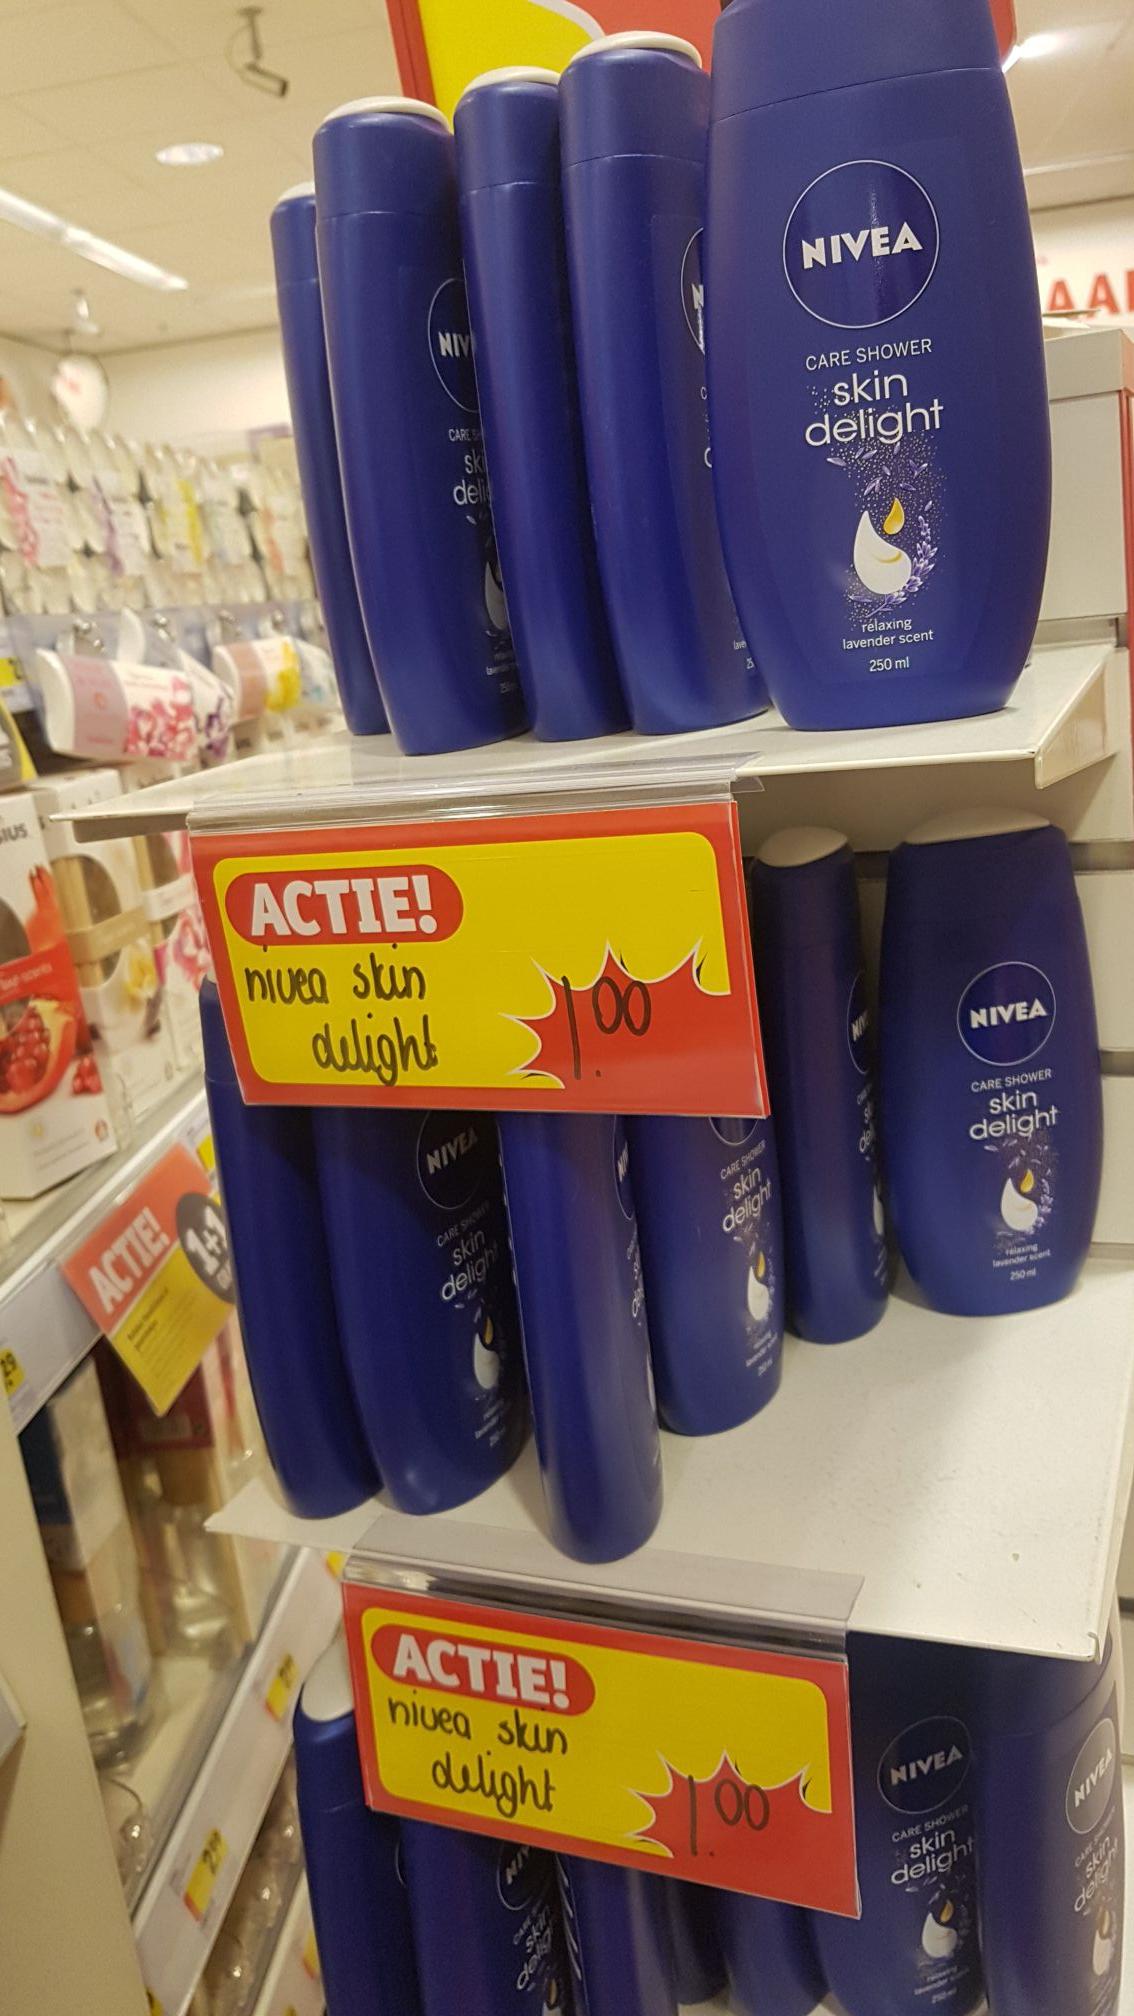 2 verpakkingen Nivea douche a 250ml voor €1.- @Kruidvat